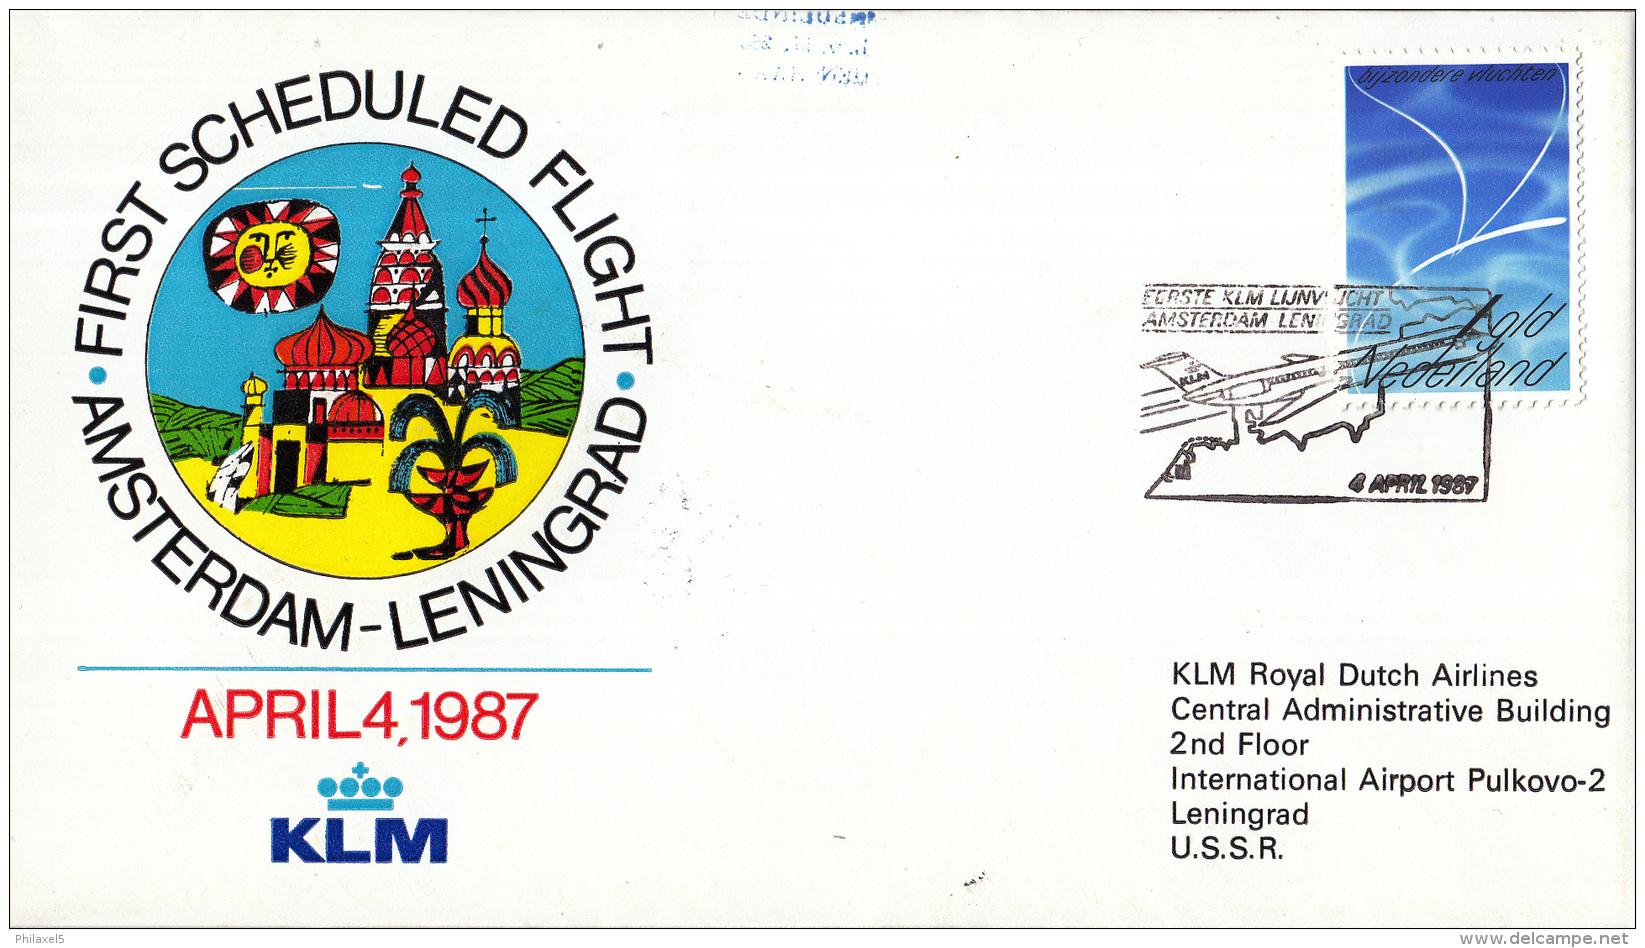 Nederland - 1ste Vlucht - 4 April 1987 - Amsterdam-Leningrad - Vl. Hol. 1080b - Marcofilie - EMA (Print Machine)